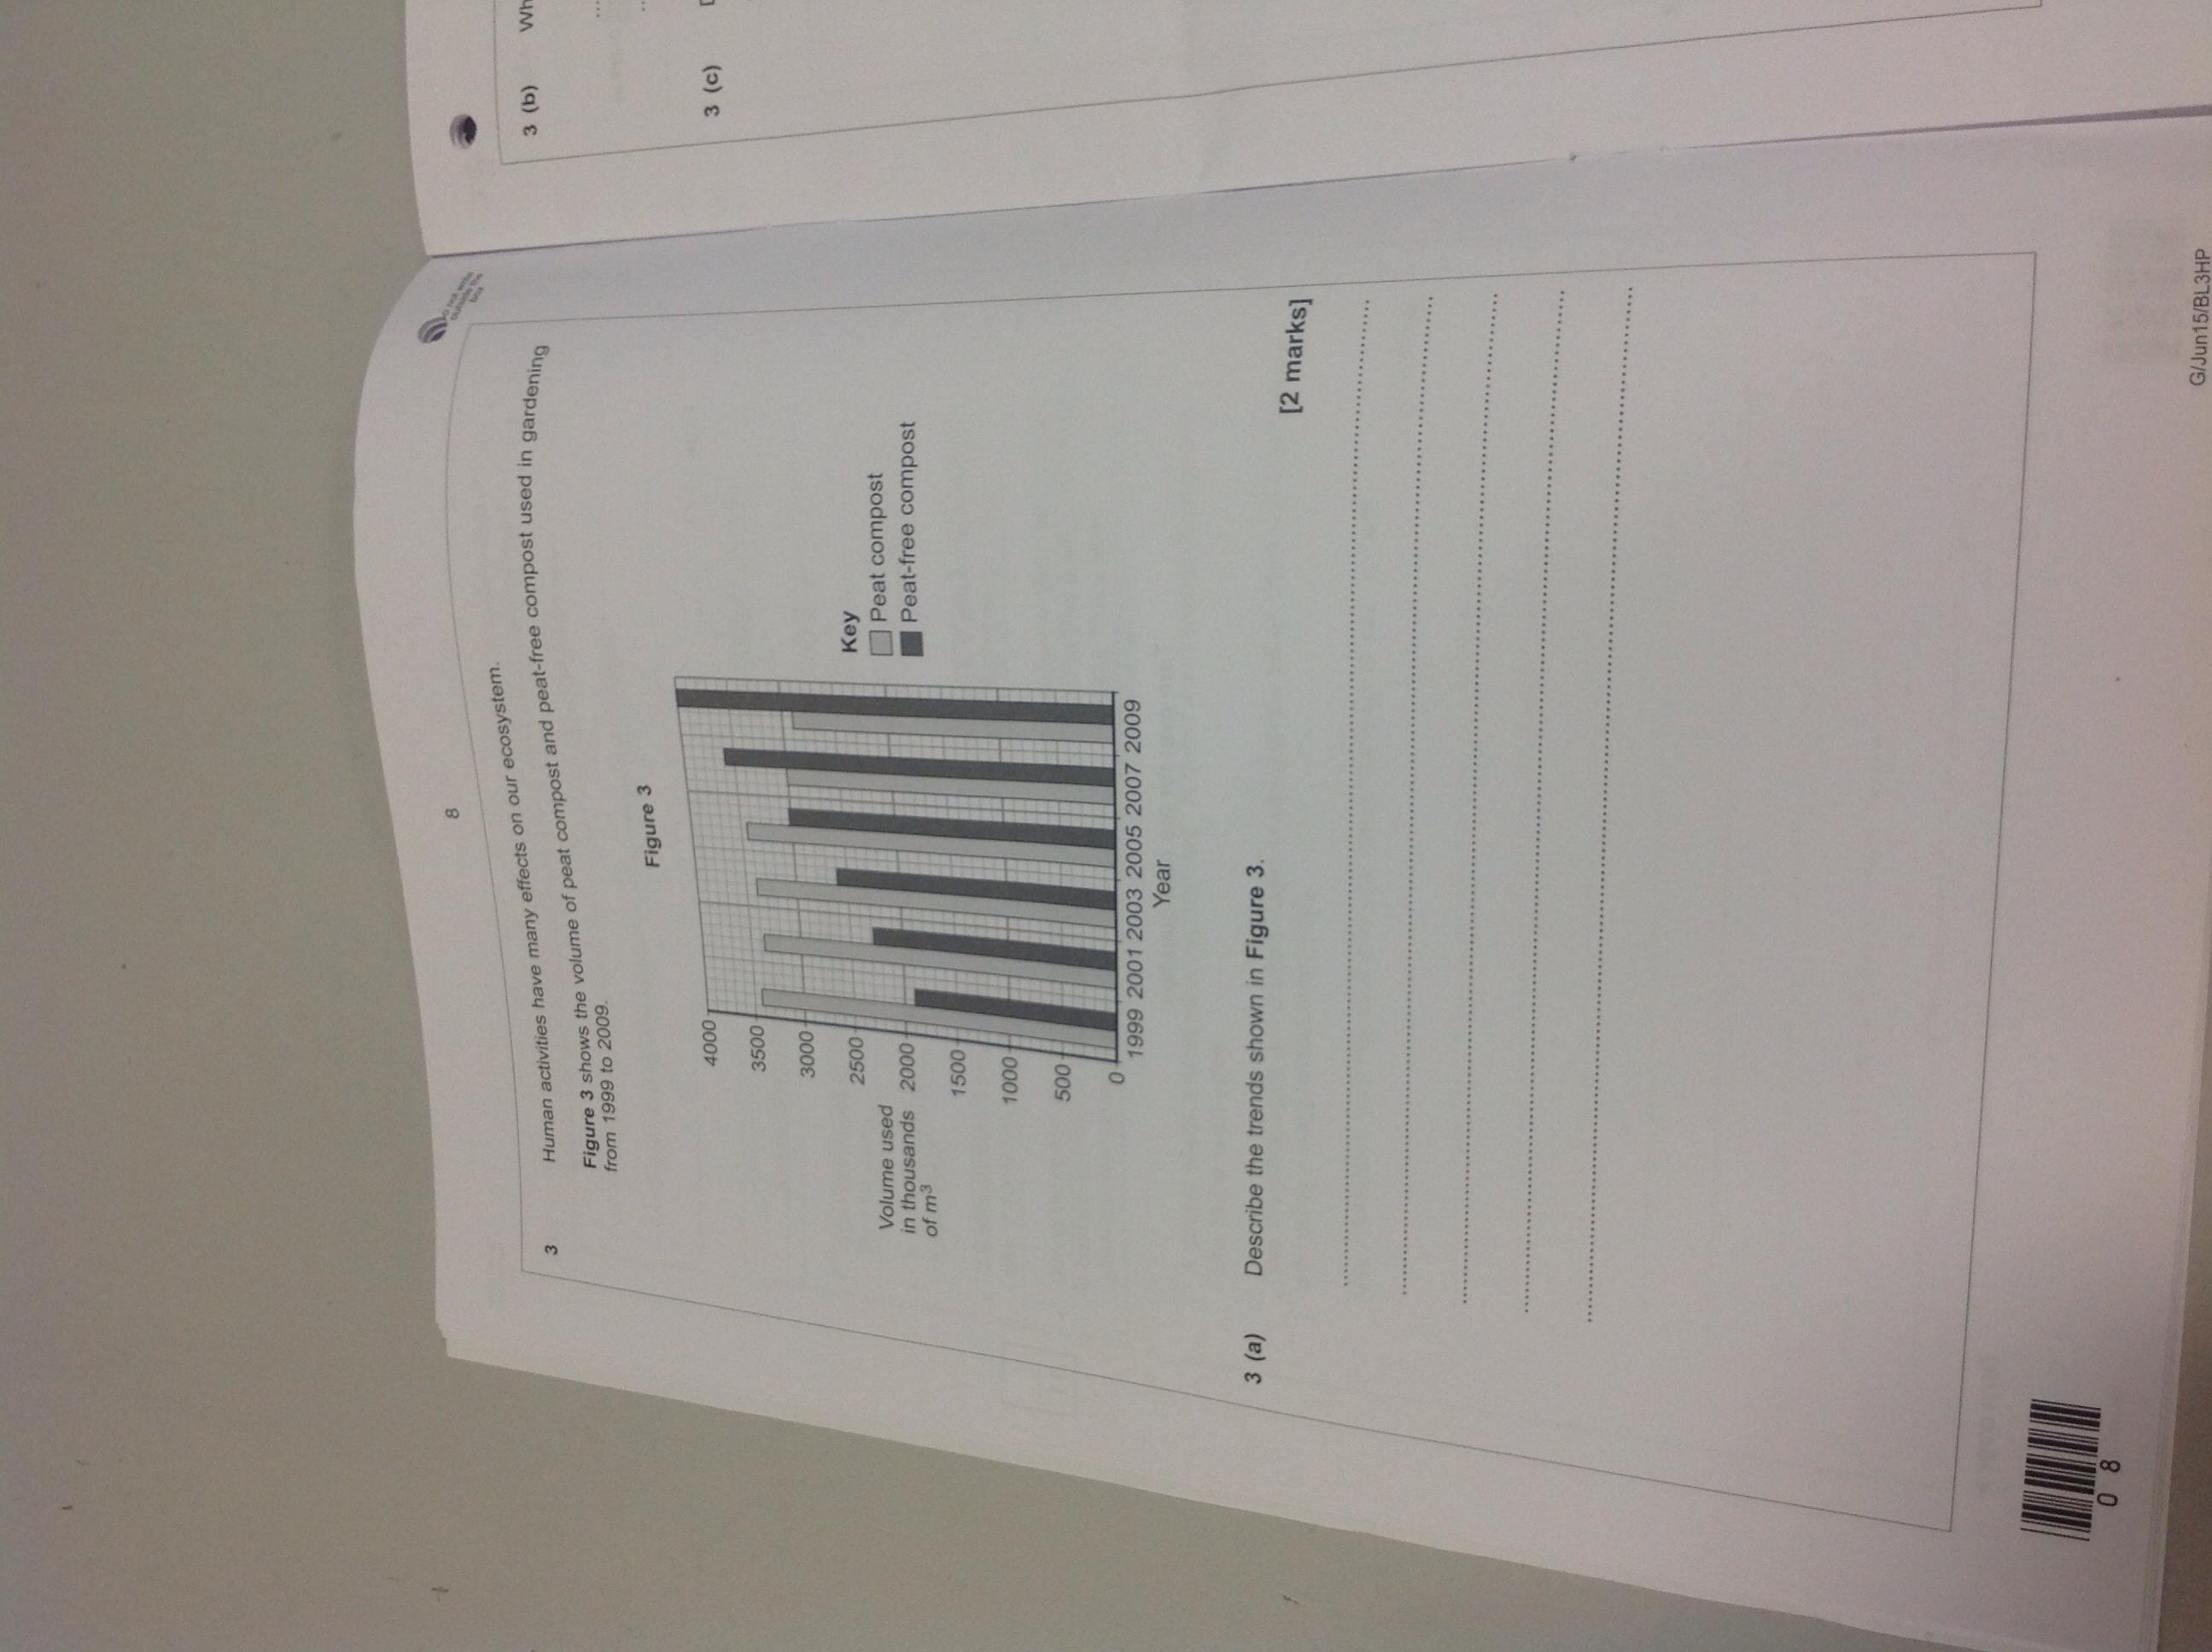 GCSE History Worksheets | Lesson Plans, Powerpoints ...